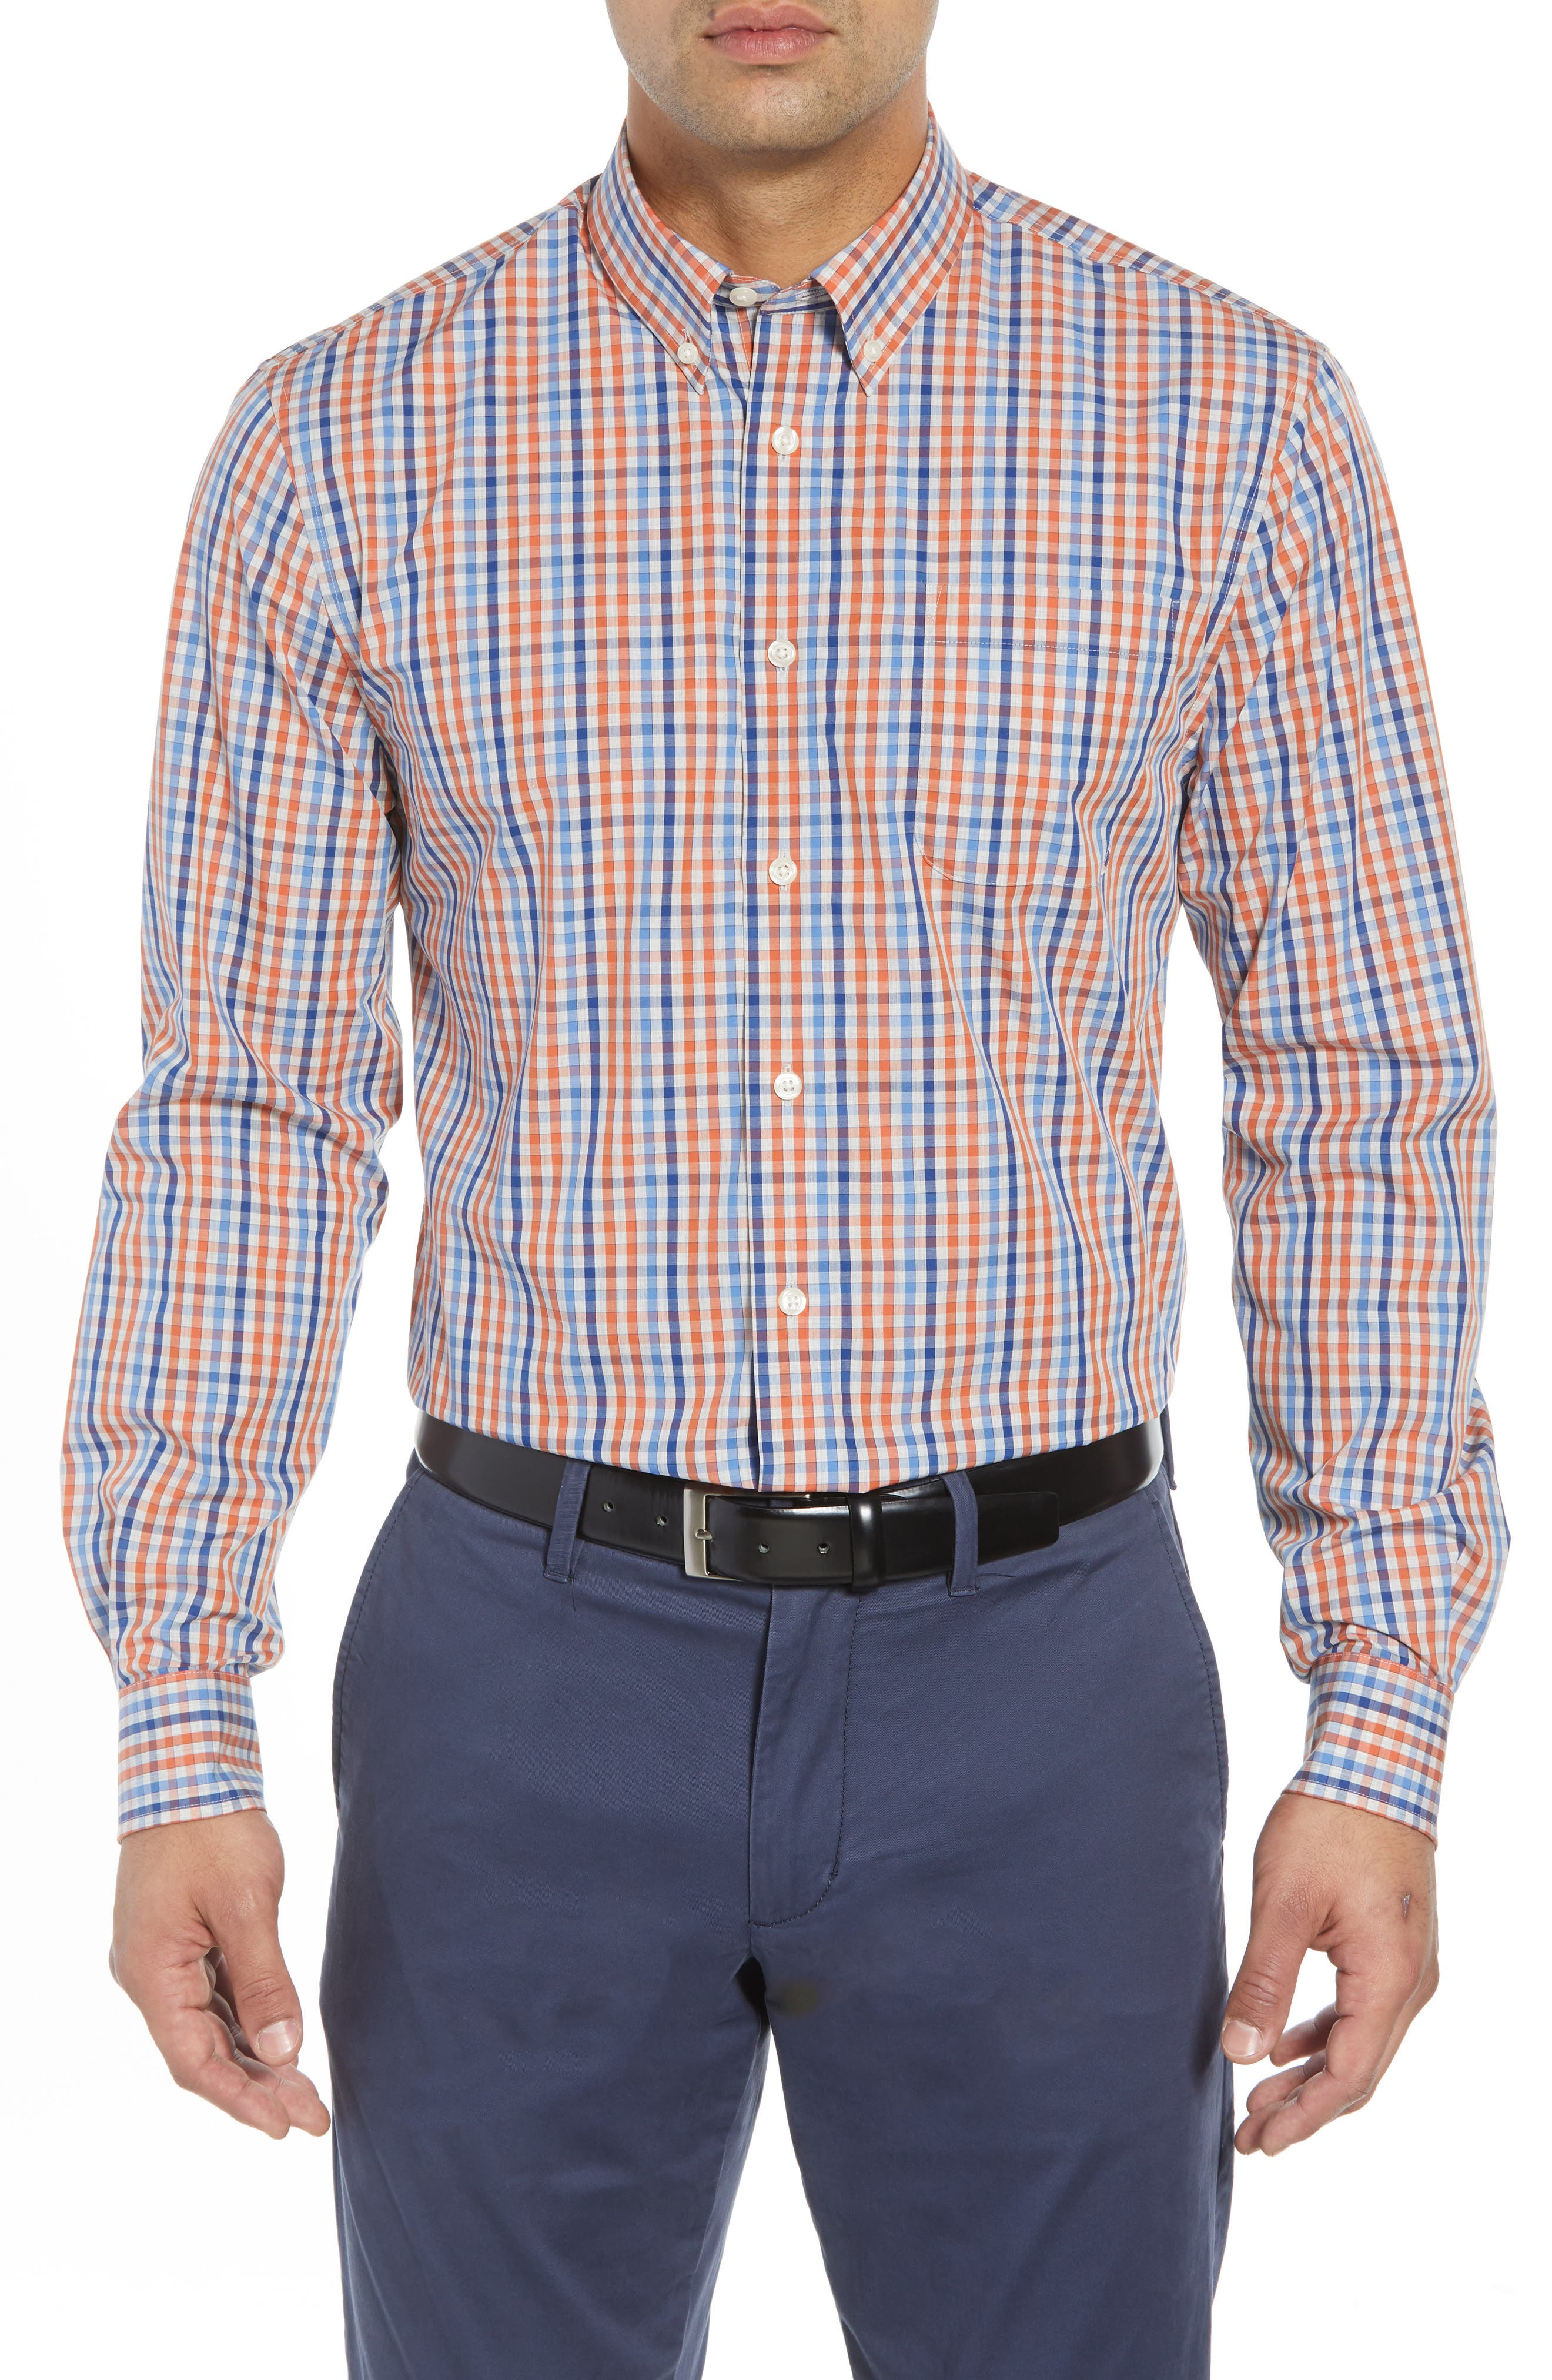 Rawlings Classic Fit Sport Shirt,                         Main,                         color, MARINER